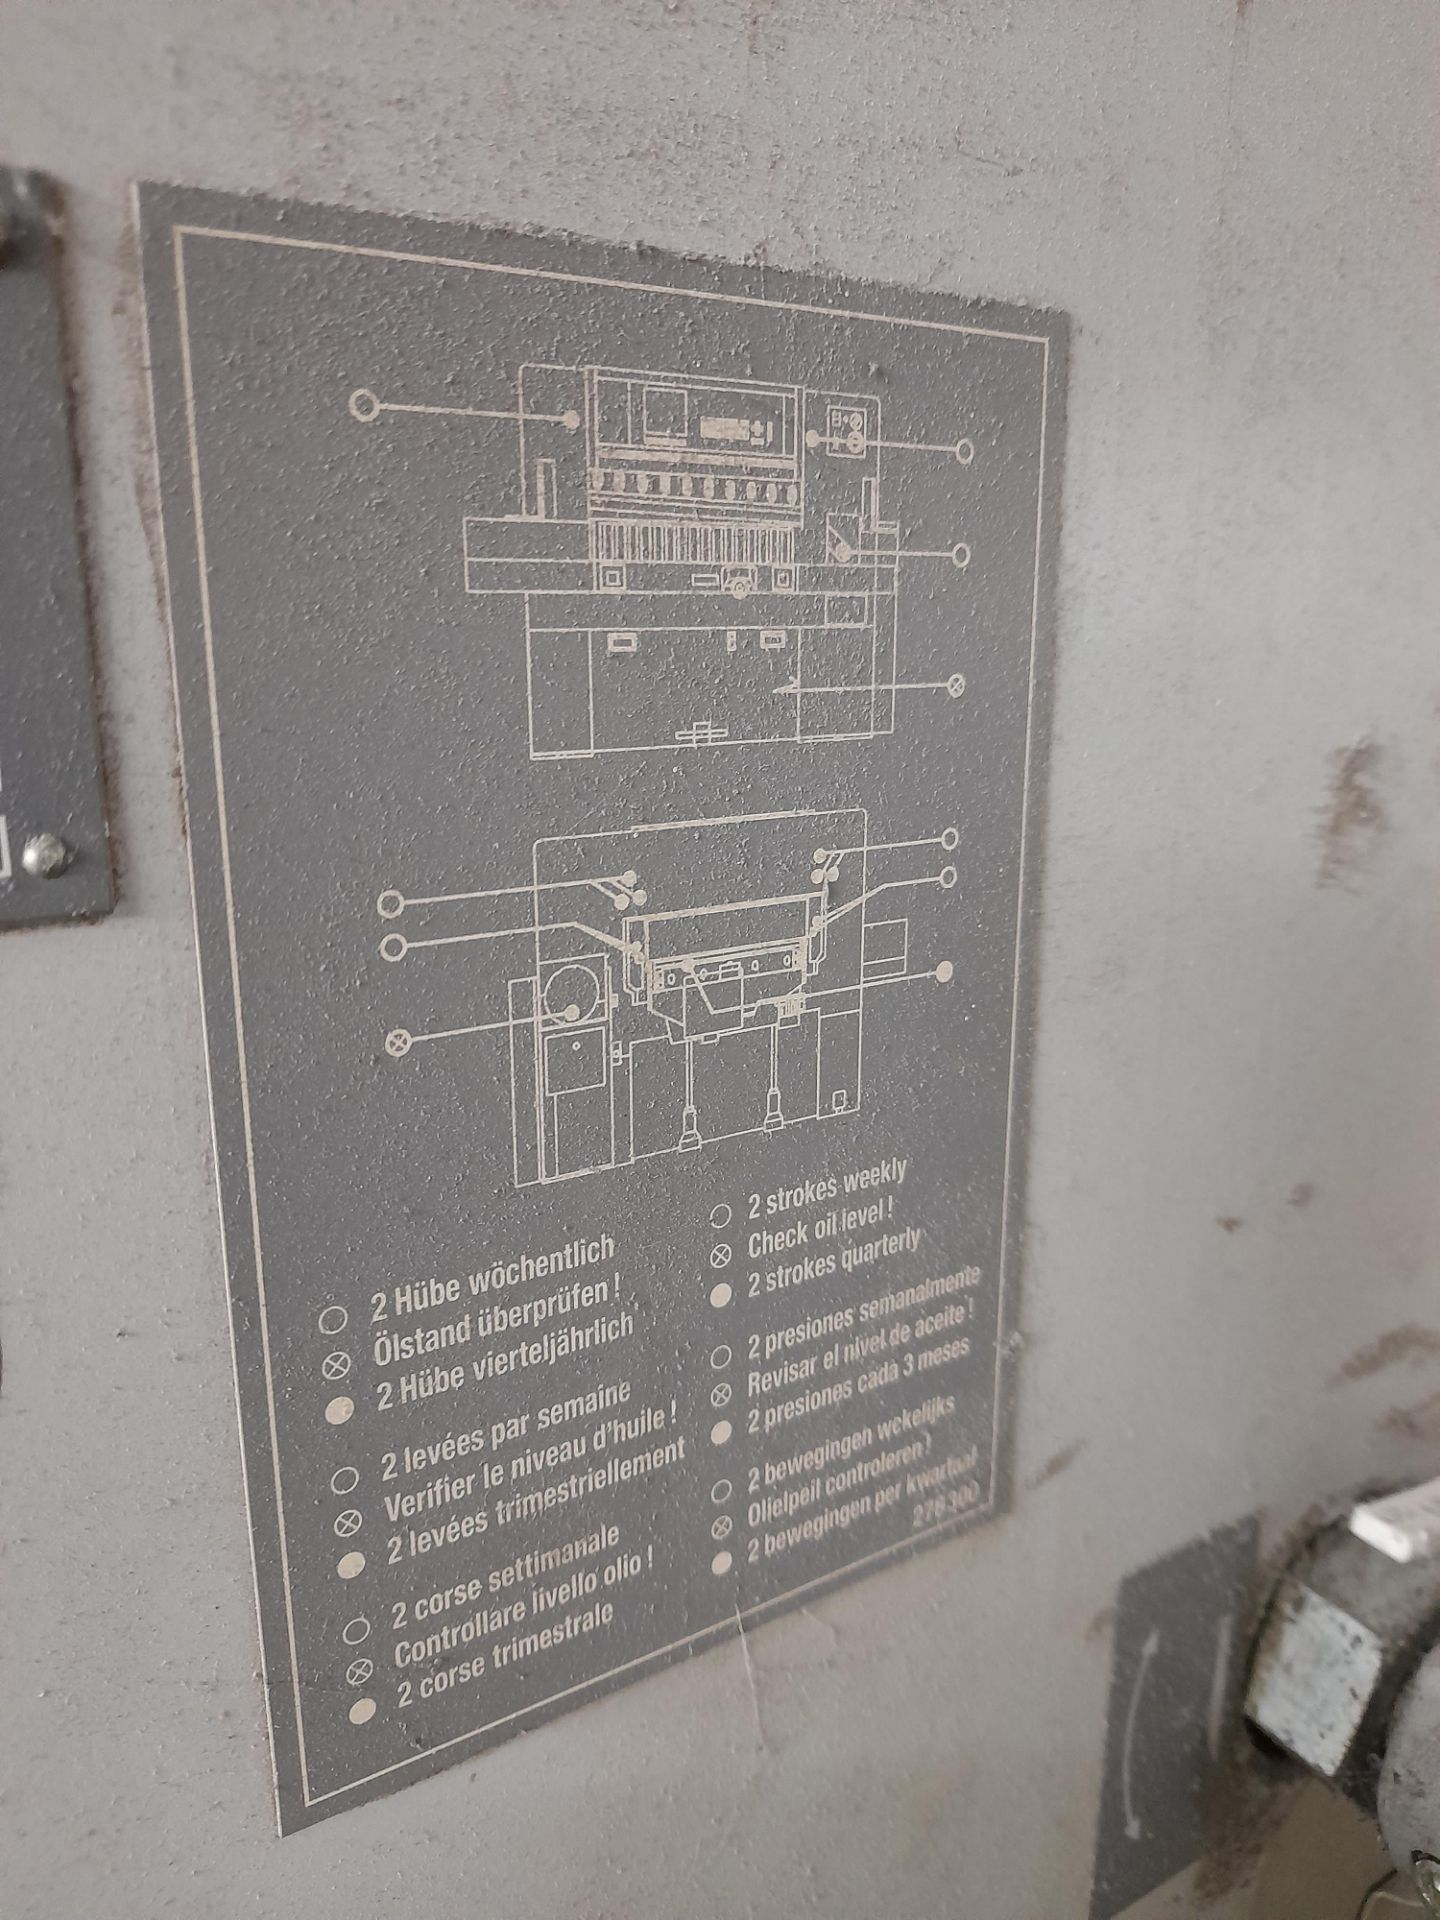 Polar Mohr 115 ED guillotine, Machine Number: 7031 - Image 8 of 9